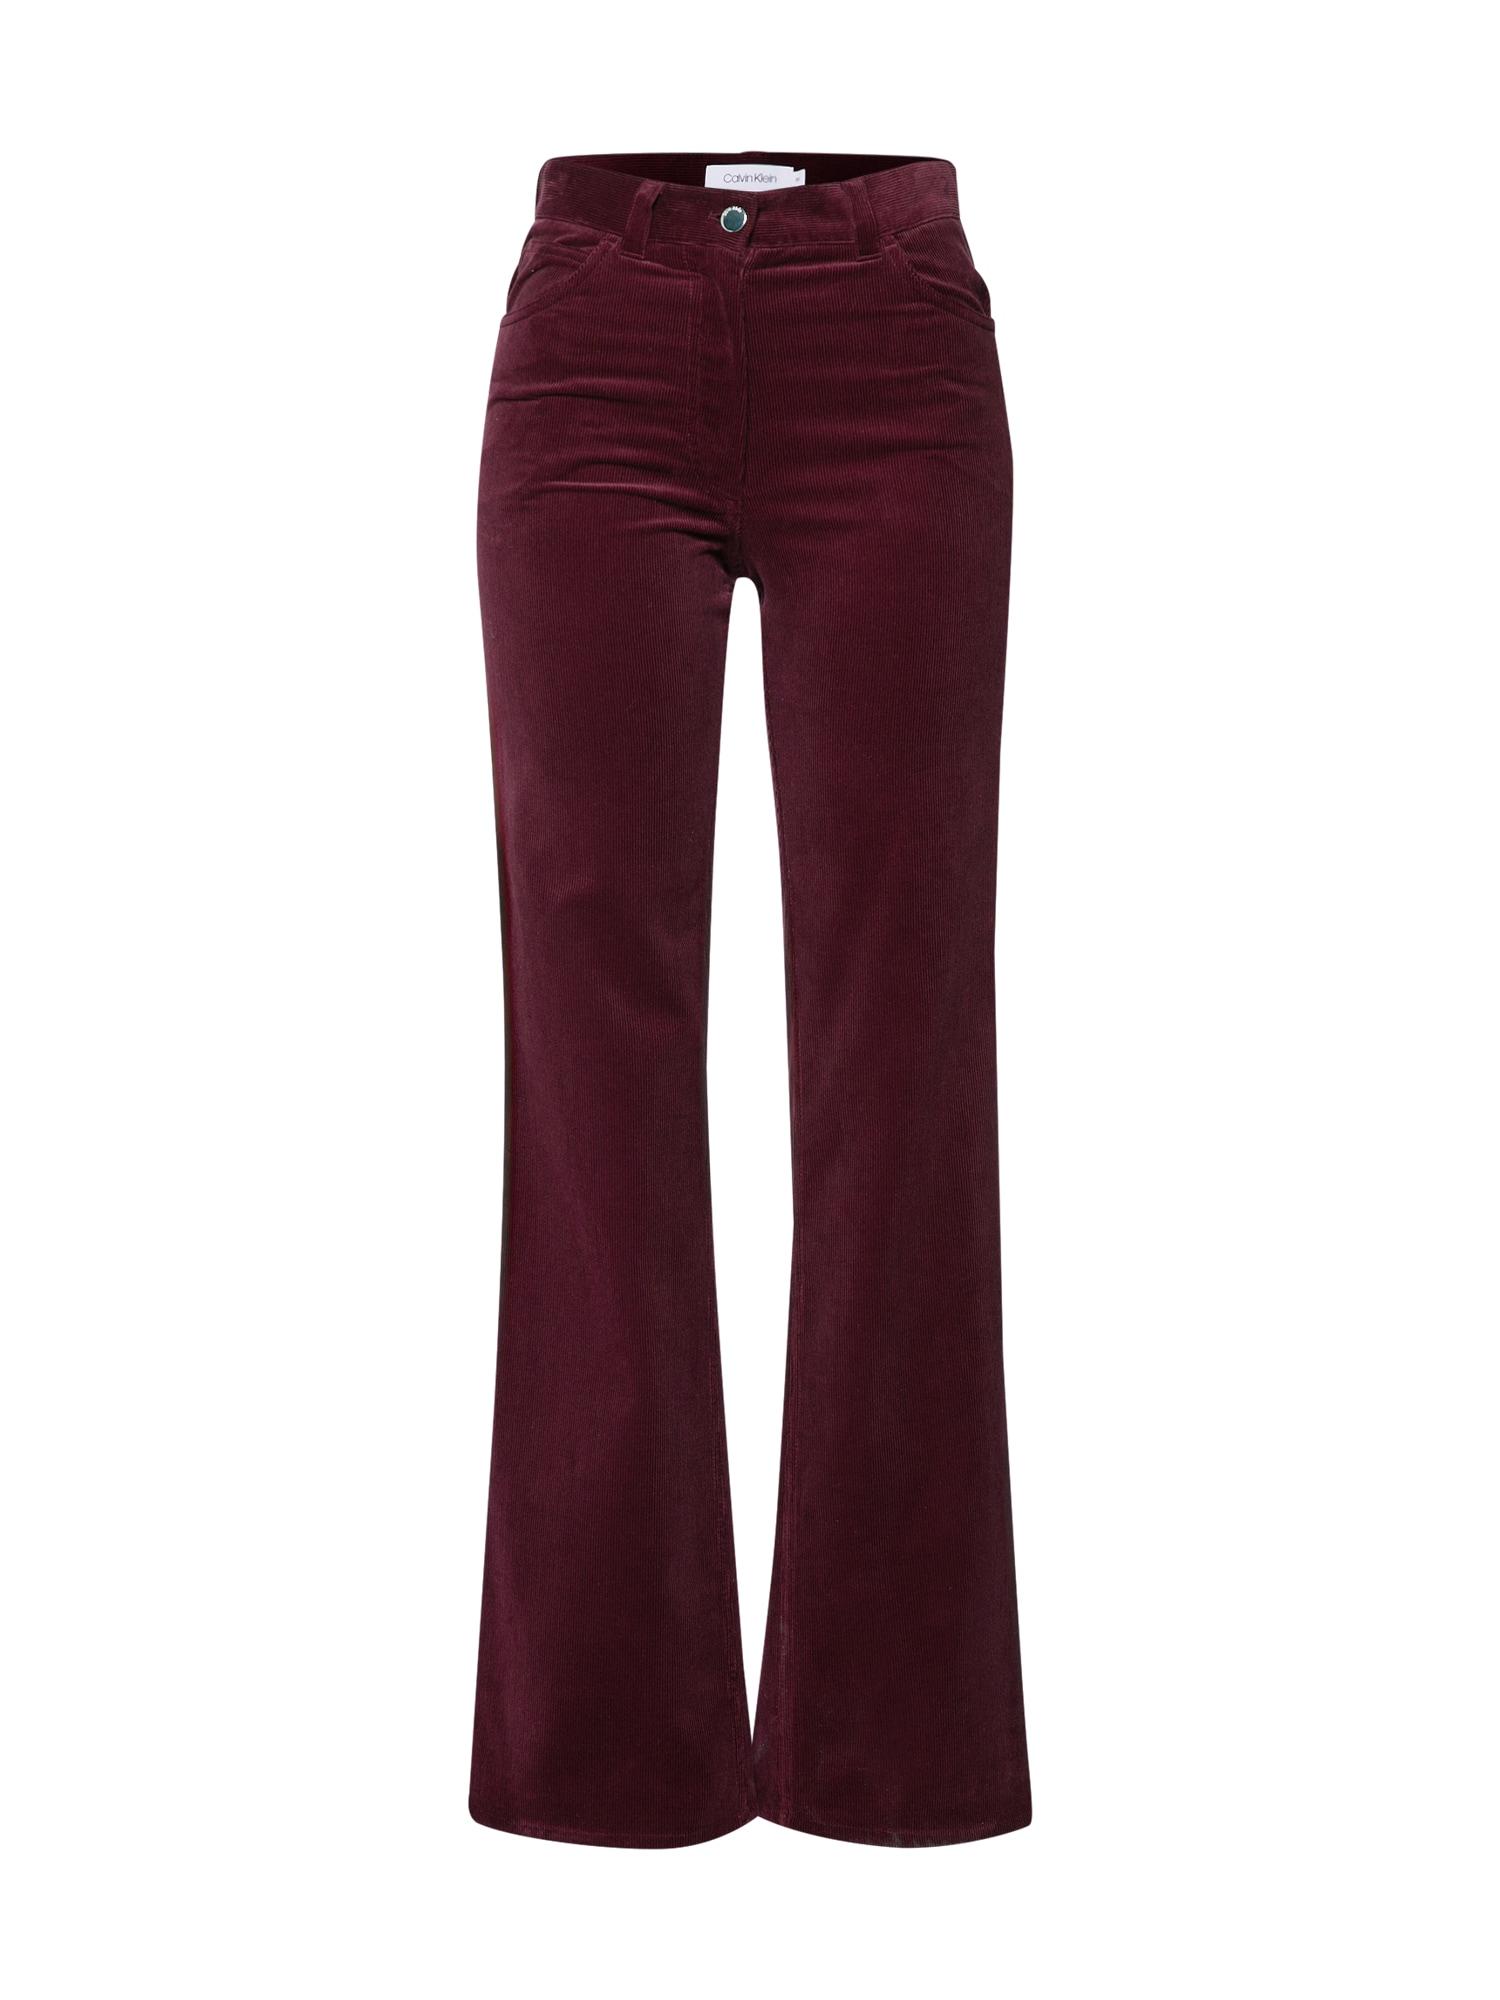 Kalhoty CORDUROY dunkelrot Calvin Klein